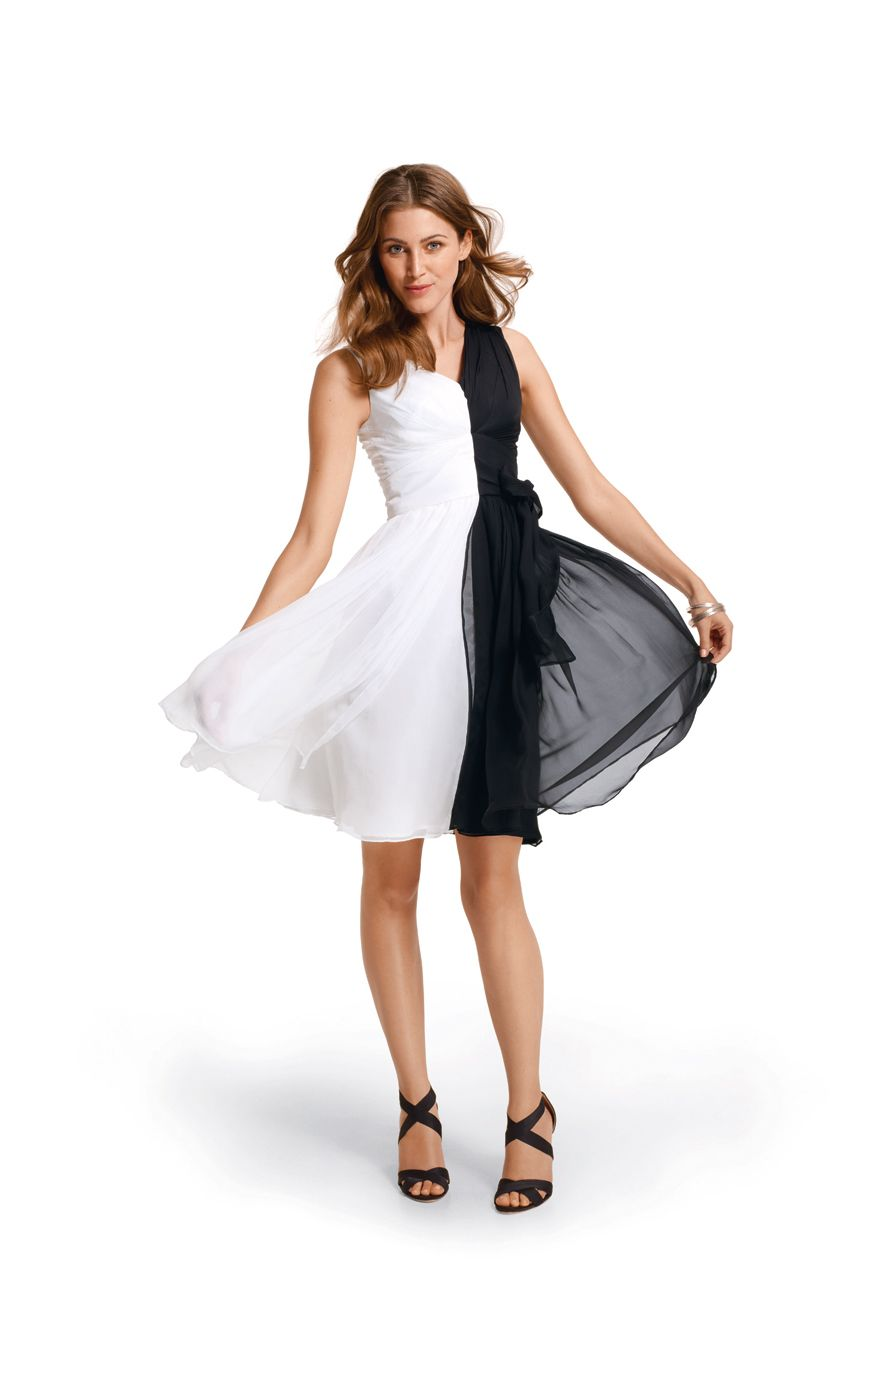 dress in #black and #white #nivea | black n white, black and